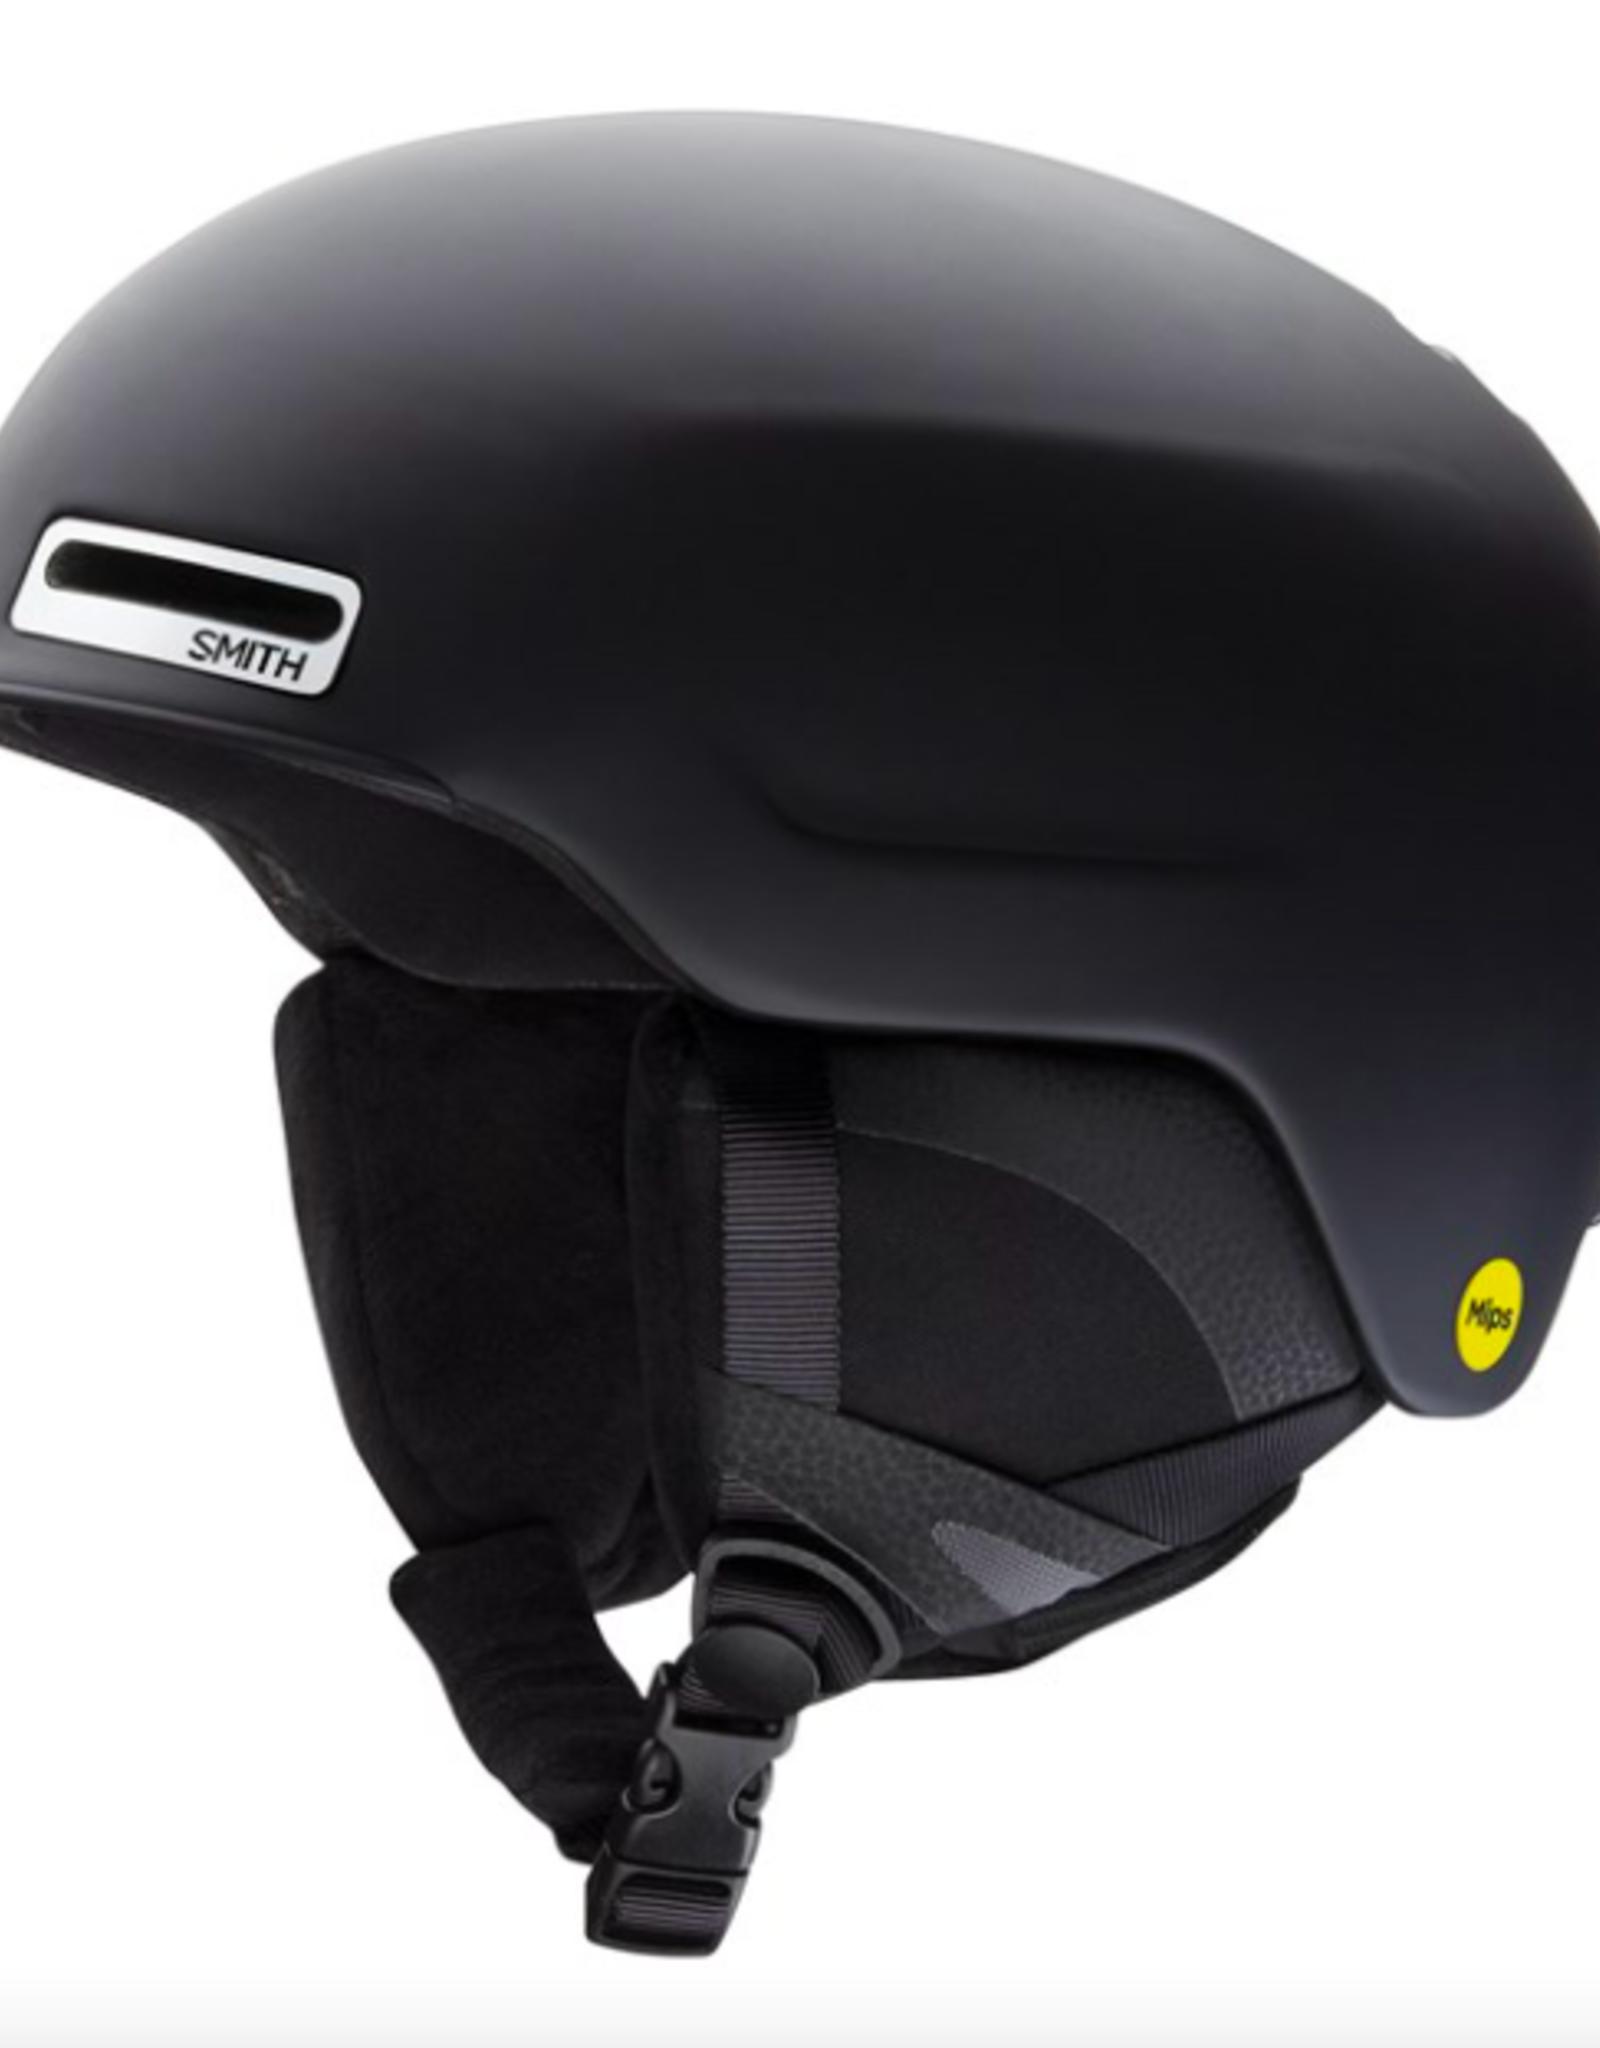 SMITH Smith Maze MIPS Round Contour Fit Helmet Matte Black 2022